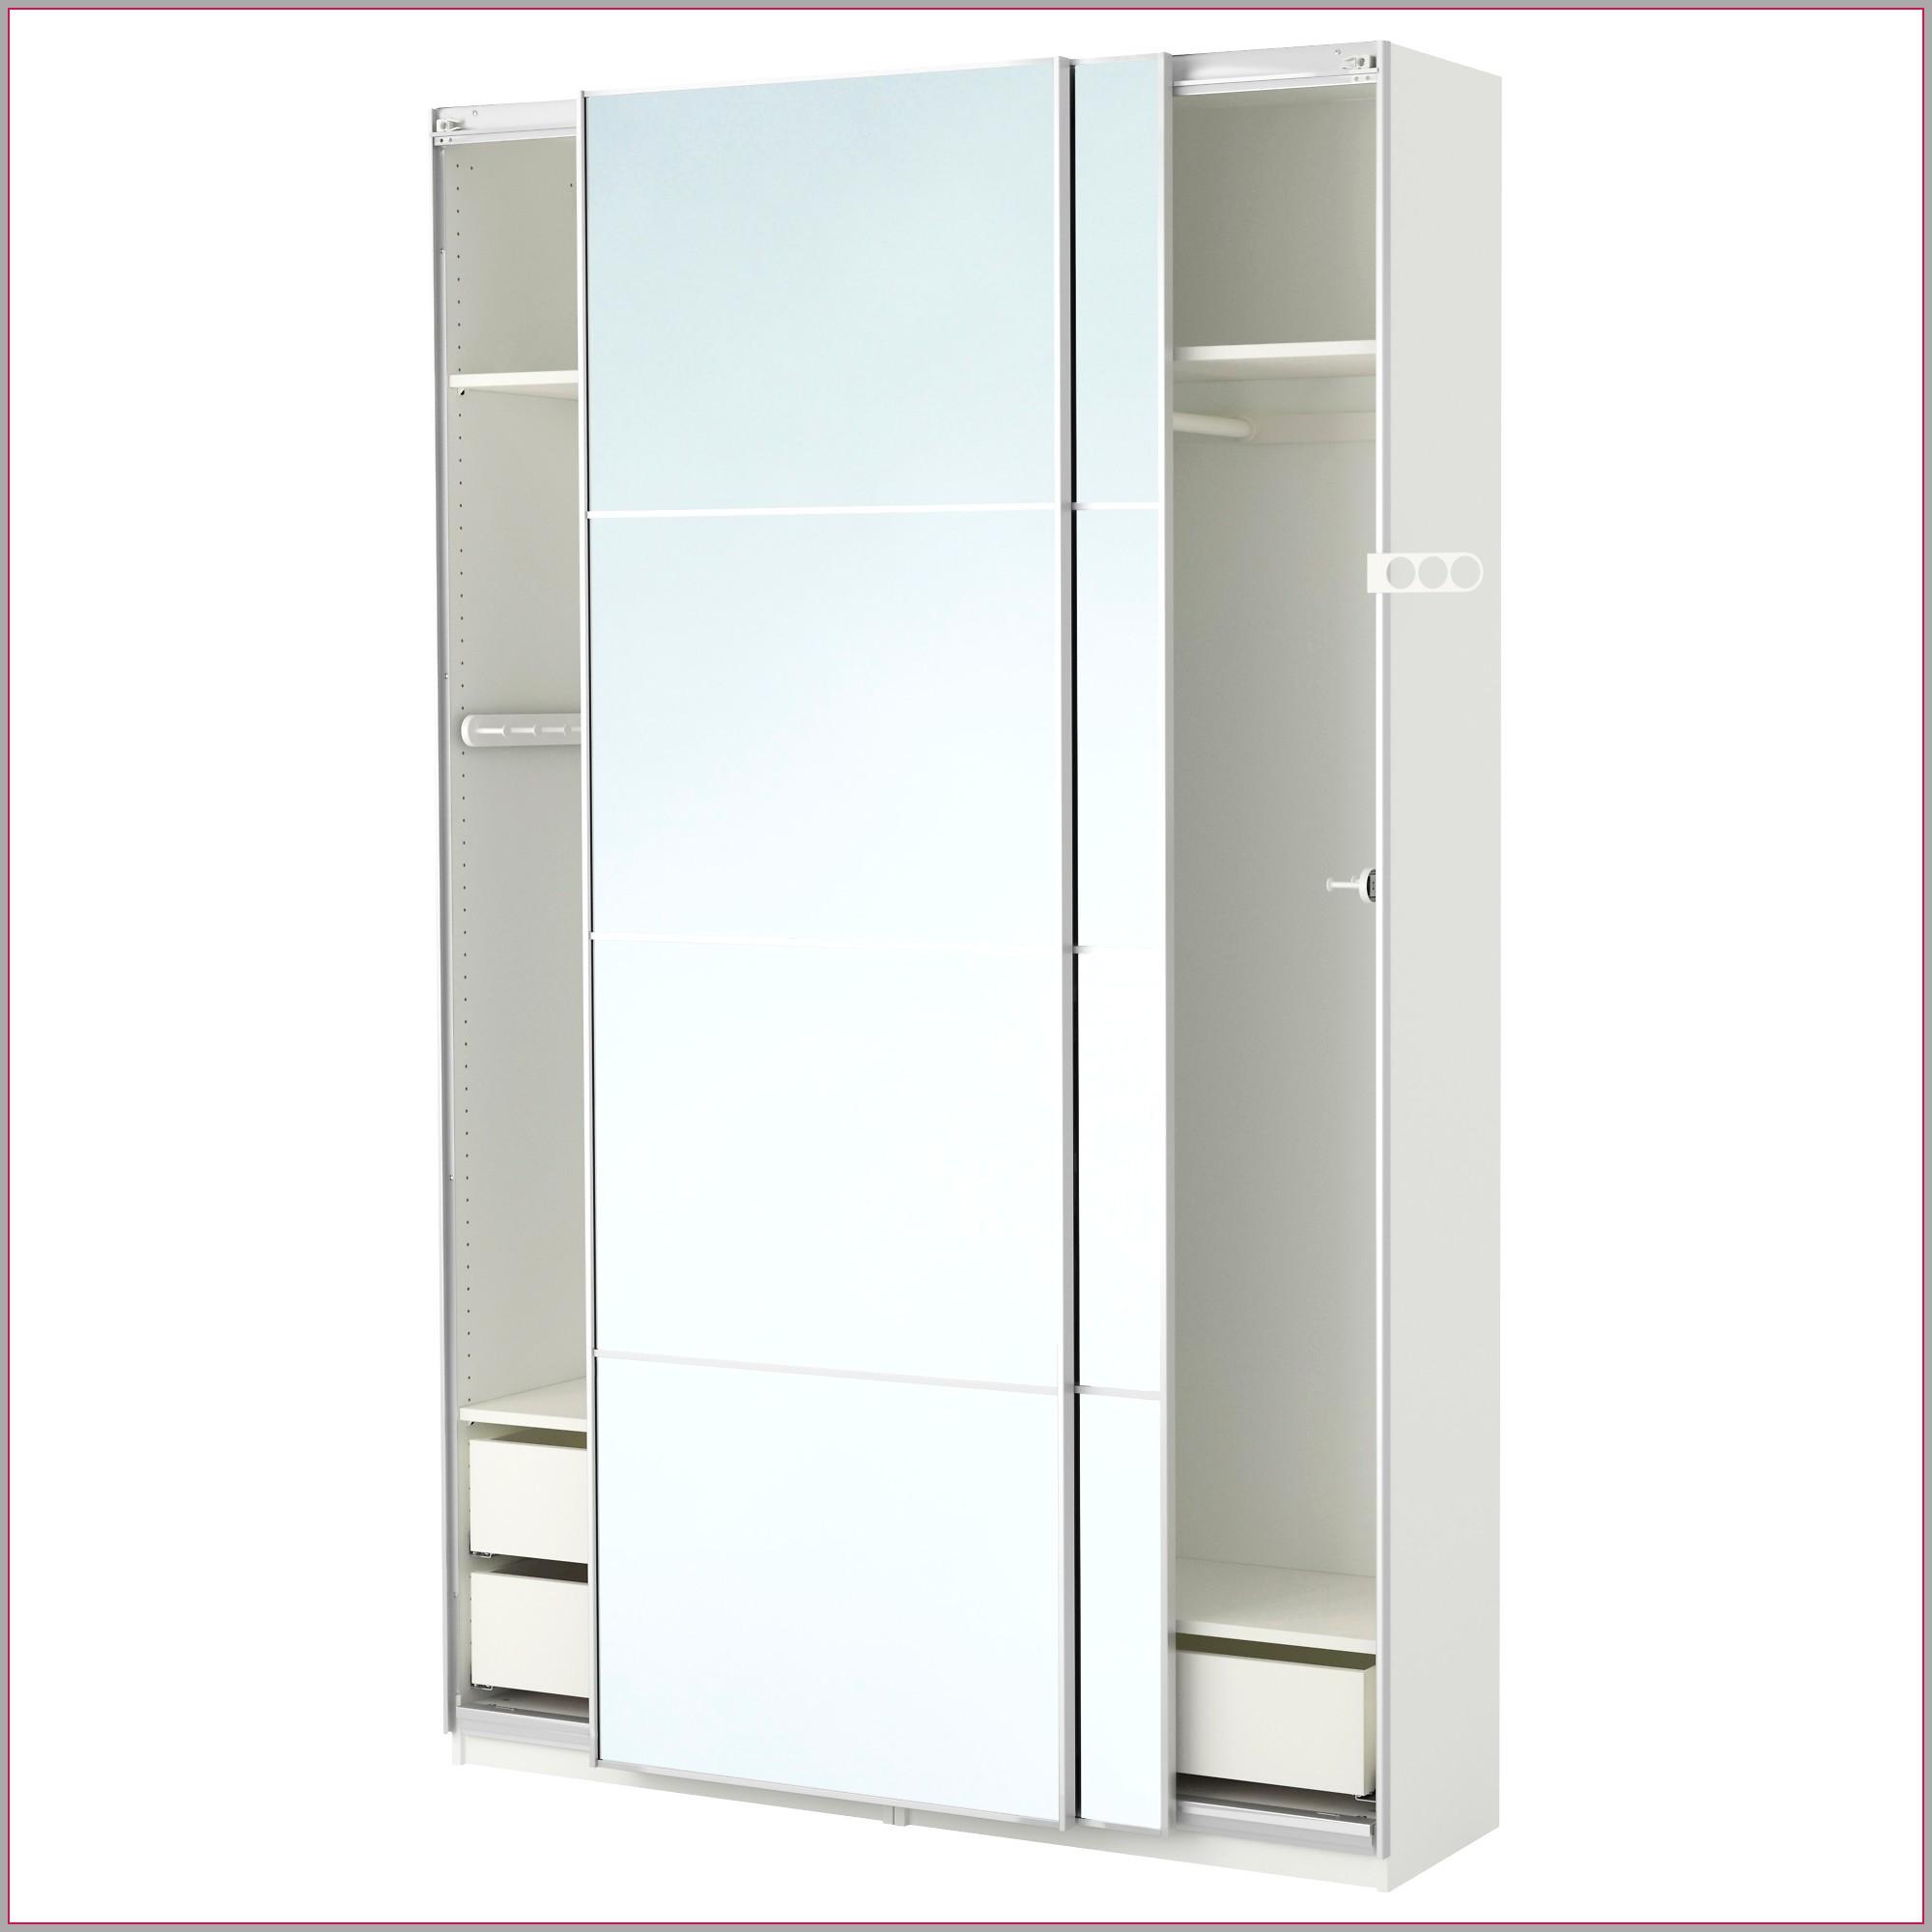 placard balai conforama armoire lit but interesting. Black Bedroom Furniture Sets. Home Design Ideas